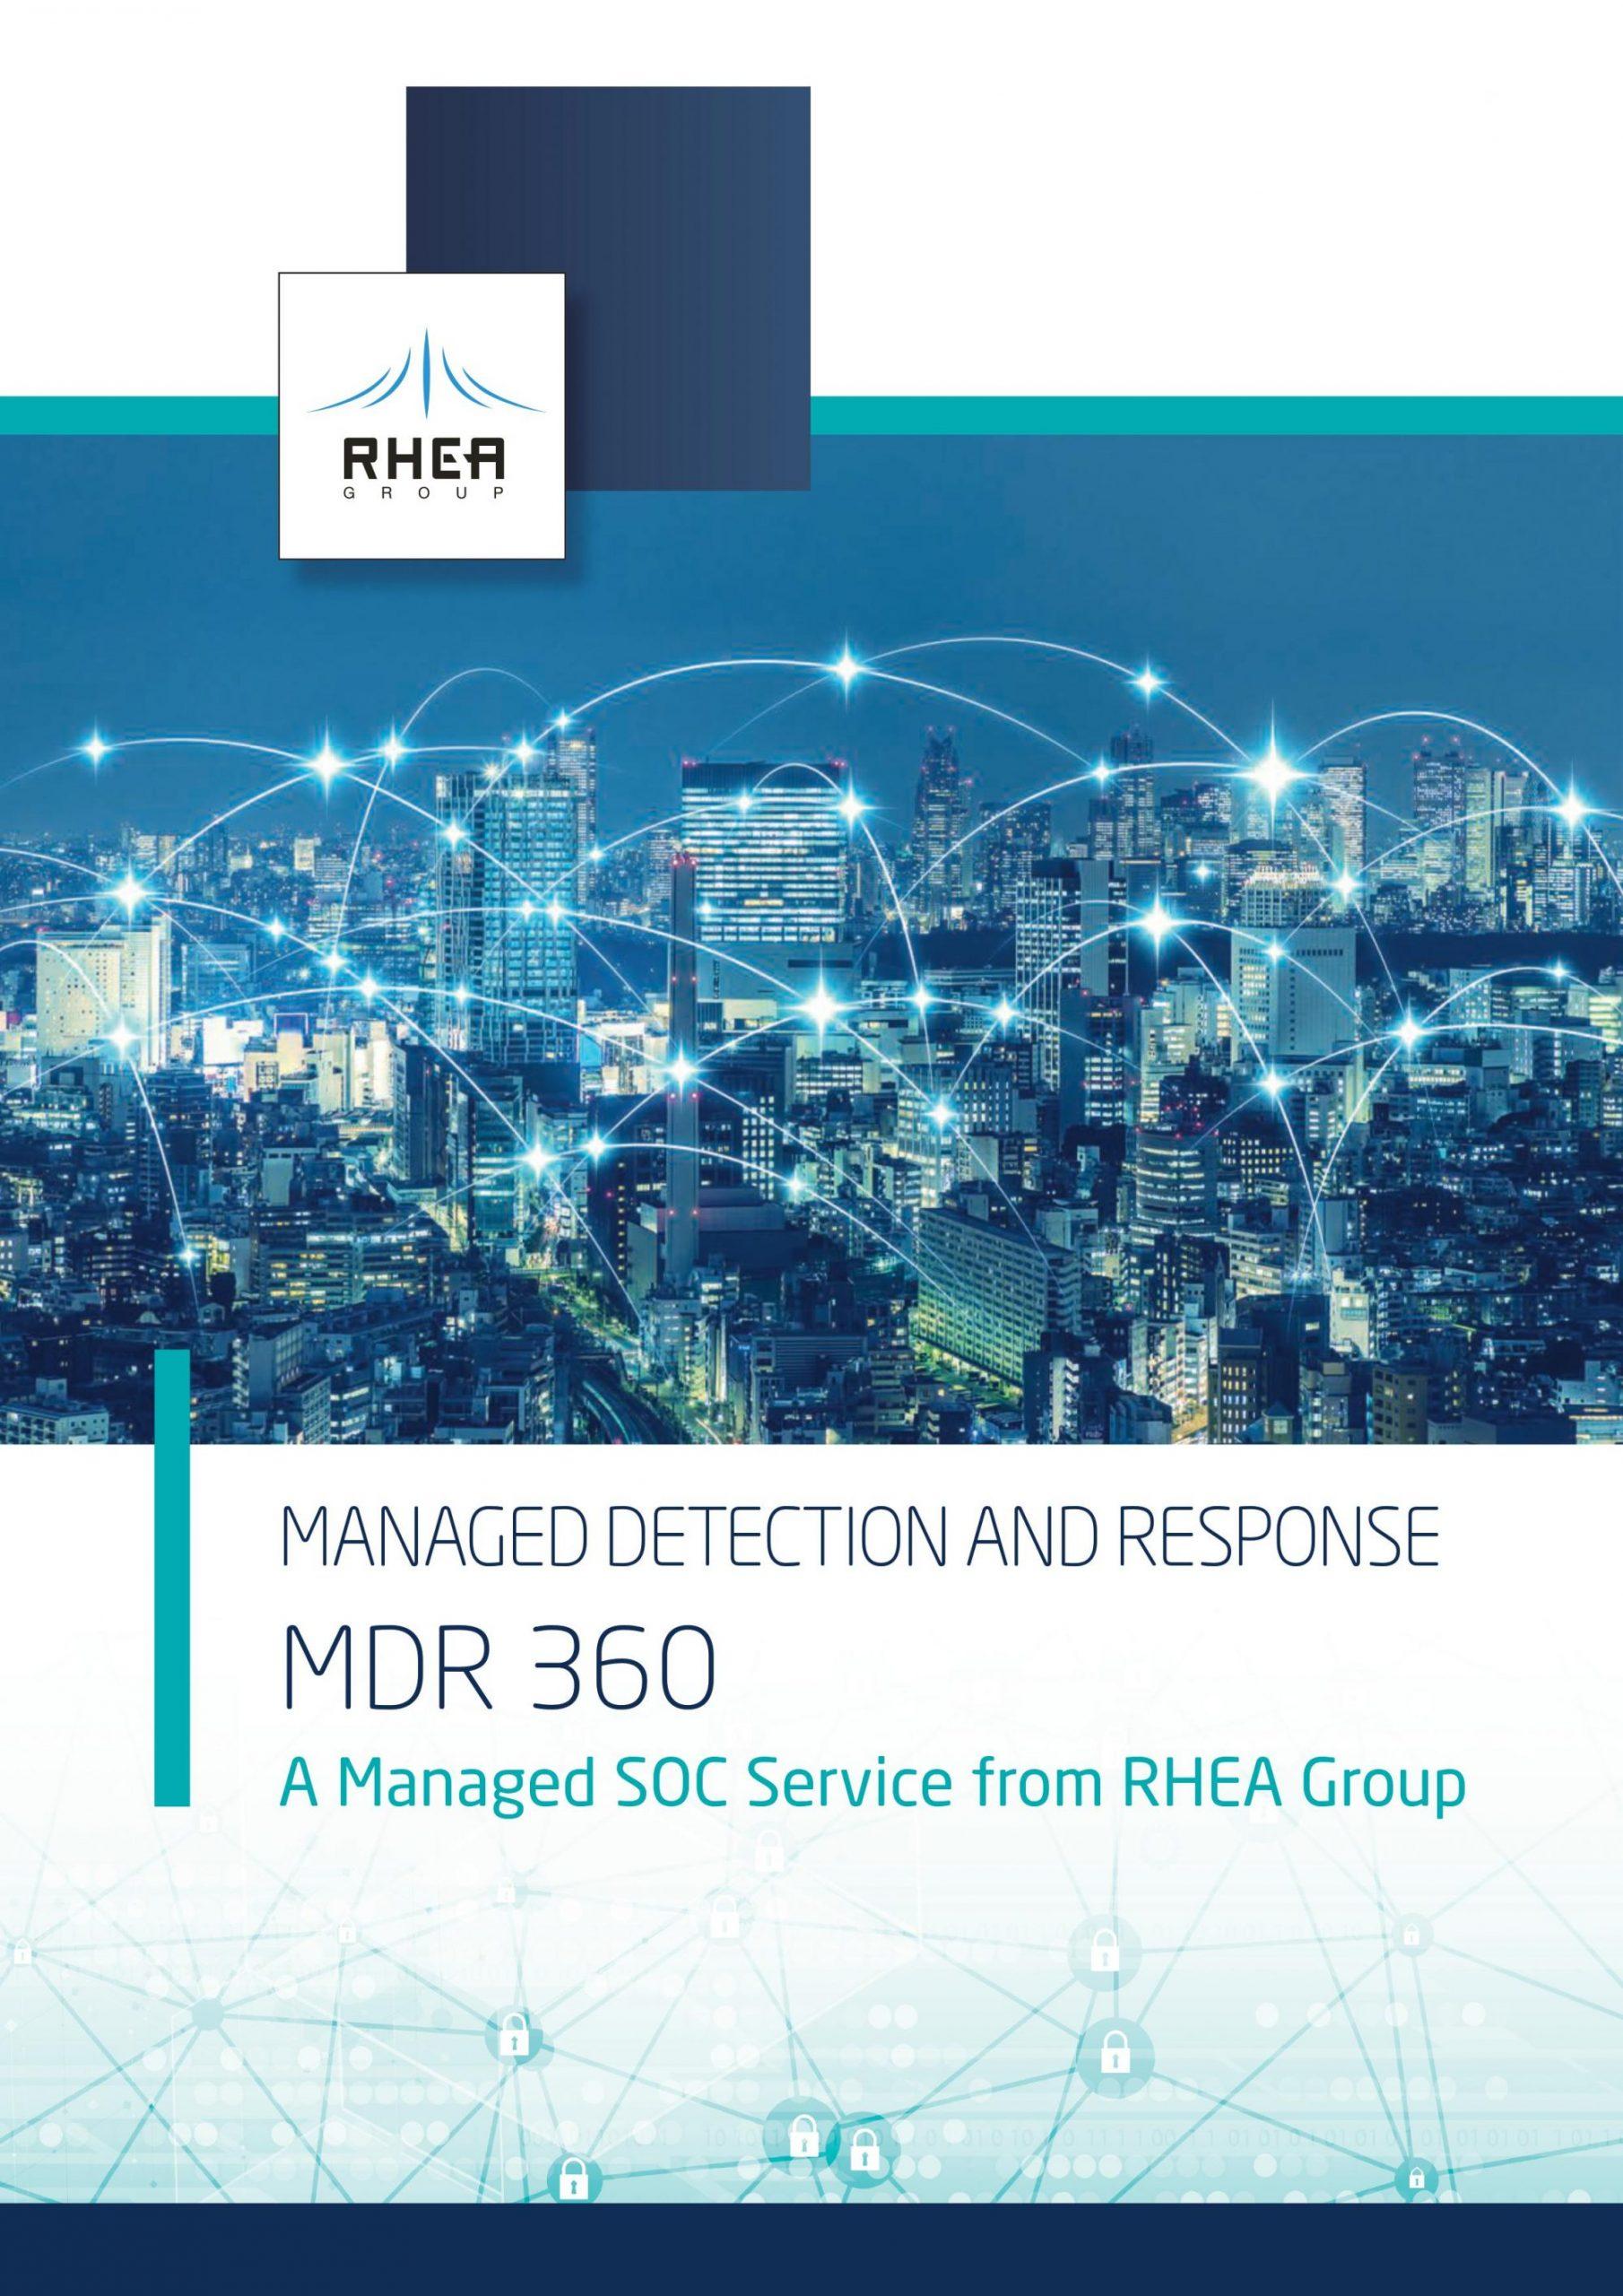 RHEA Group MDR 360 brochure cover